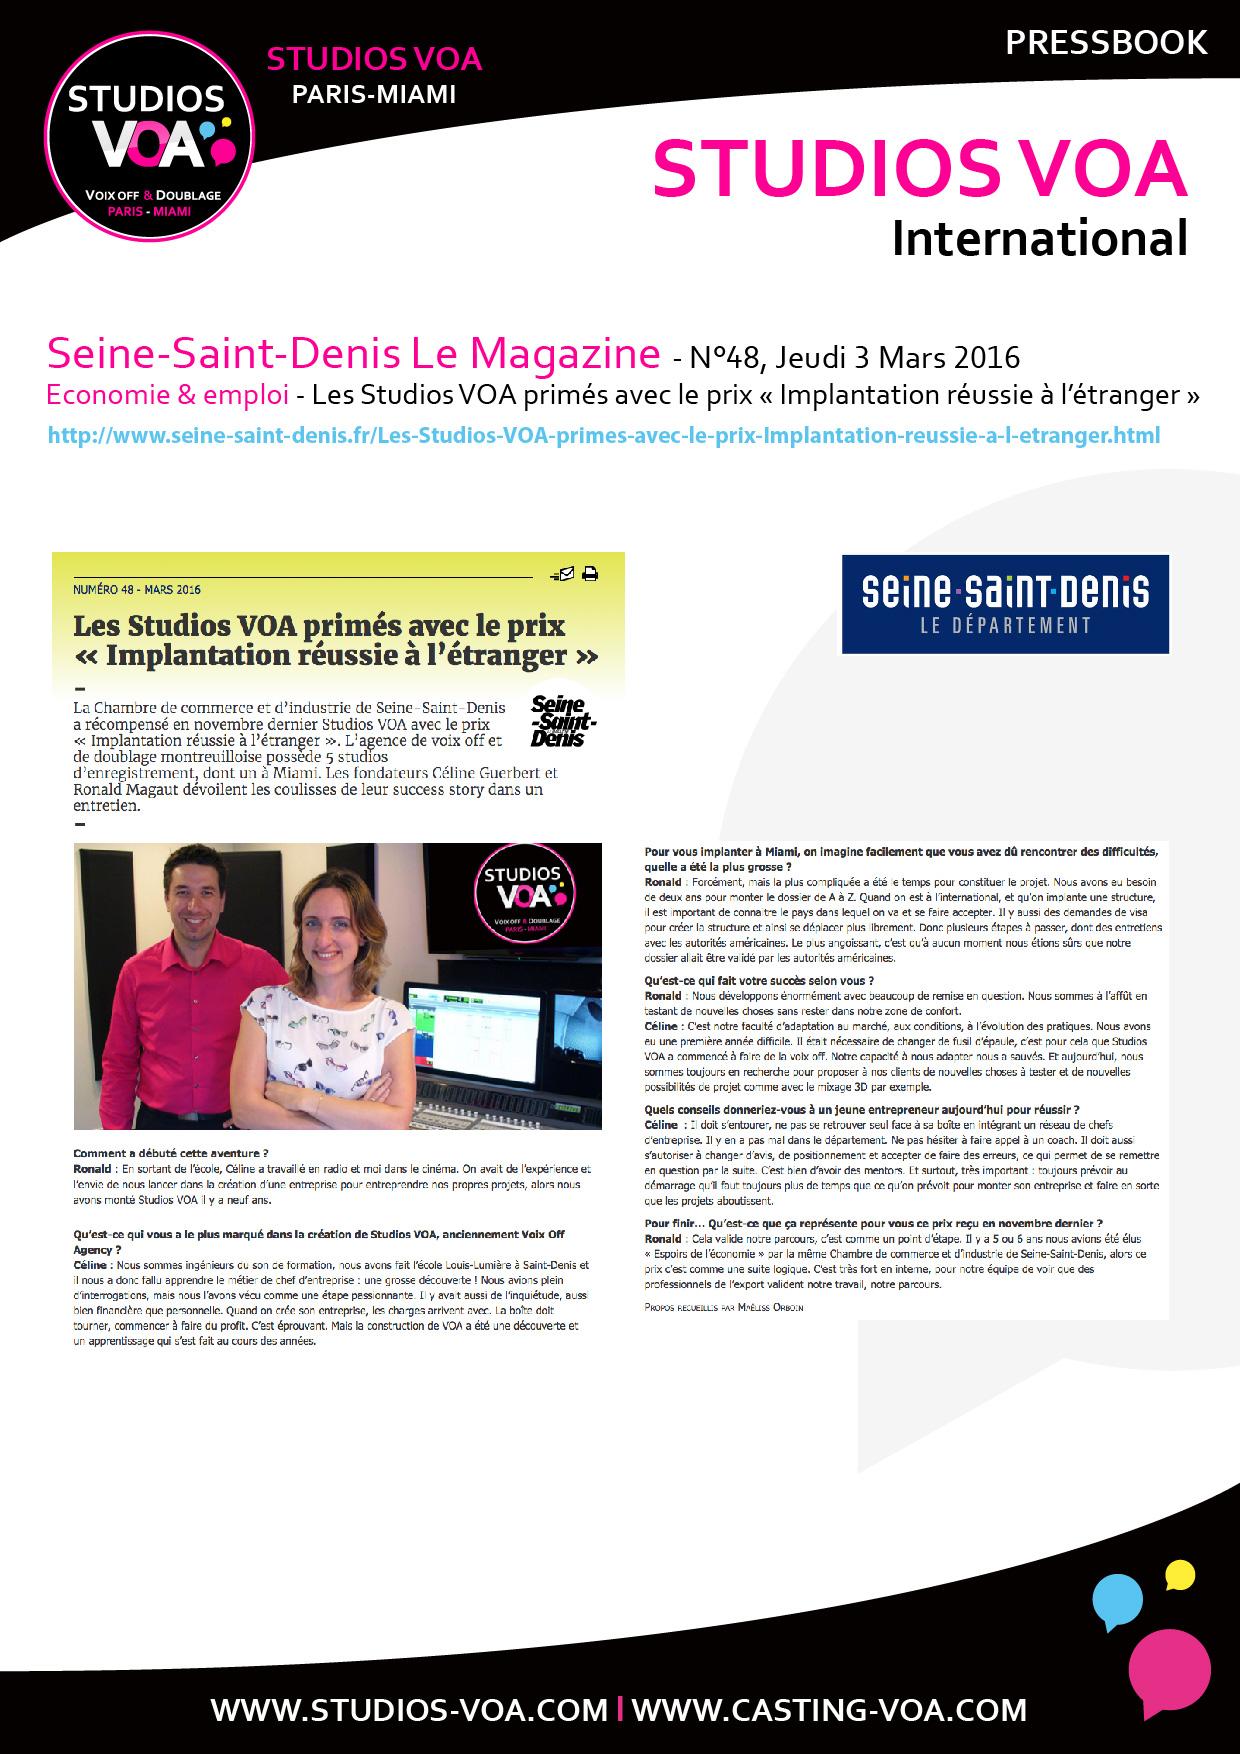 Pressbook-VOA_160322_Seine-St-Denis_Plan-de-travail-222-copie-2